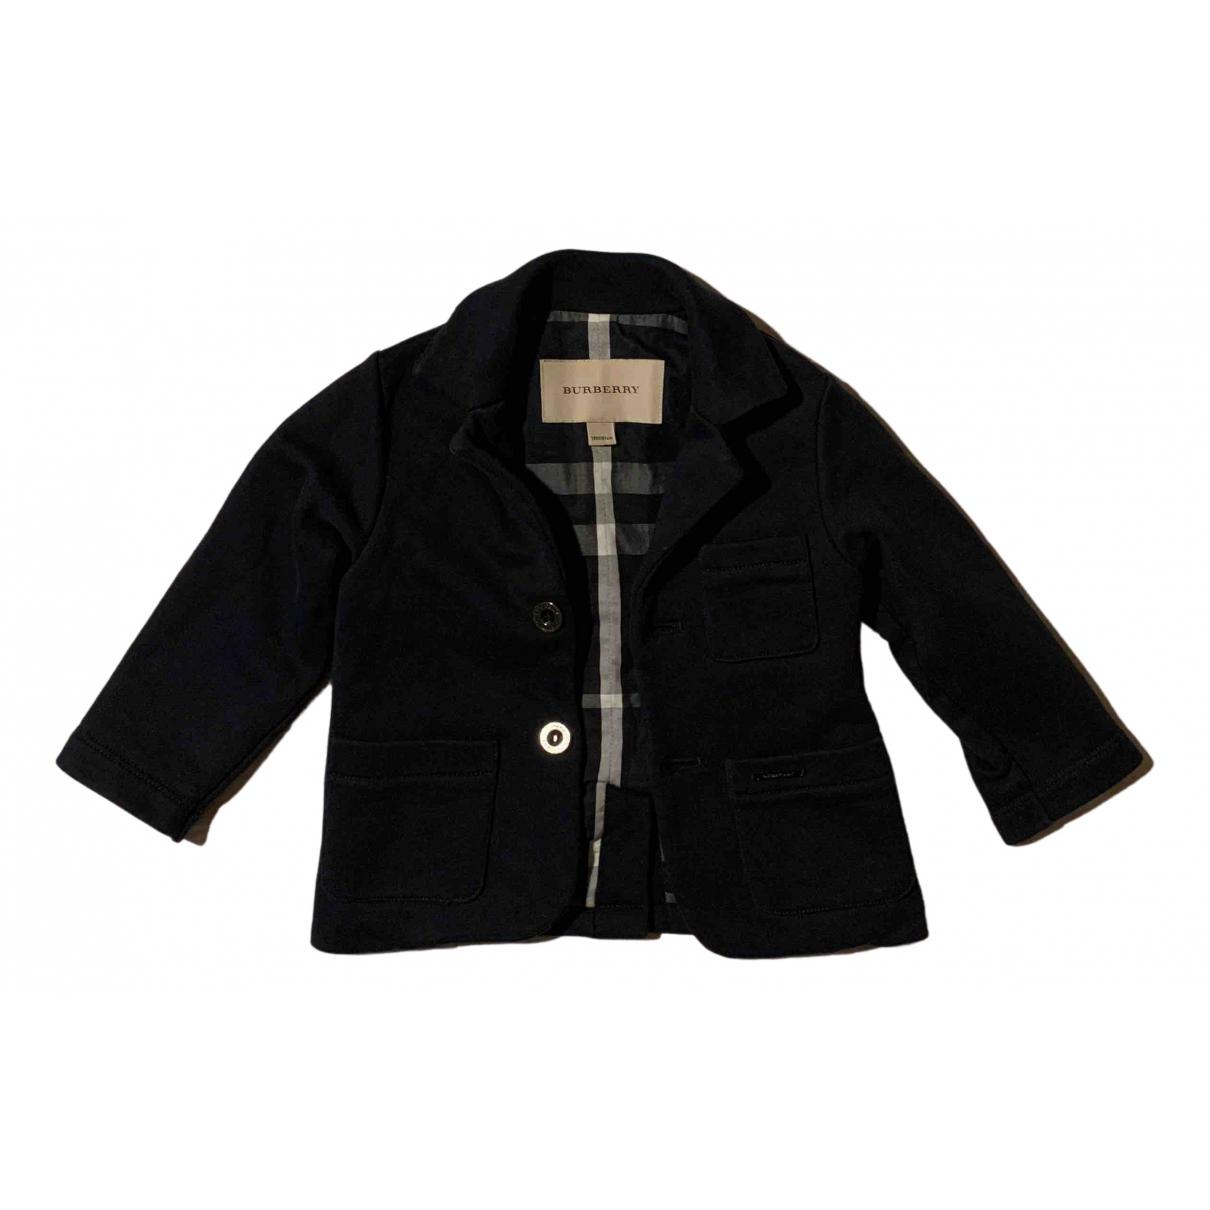 Burberry N Blue Cotton jacket & coat for Kids 18 months - up to 81cm FR